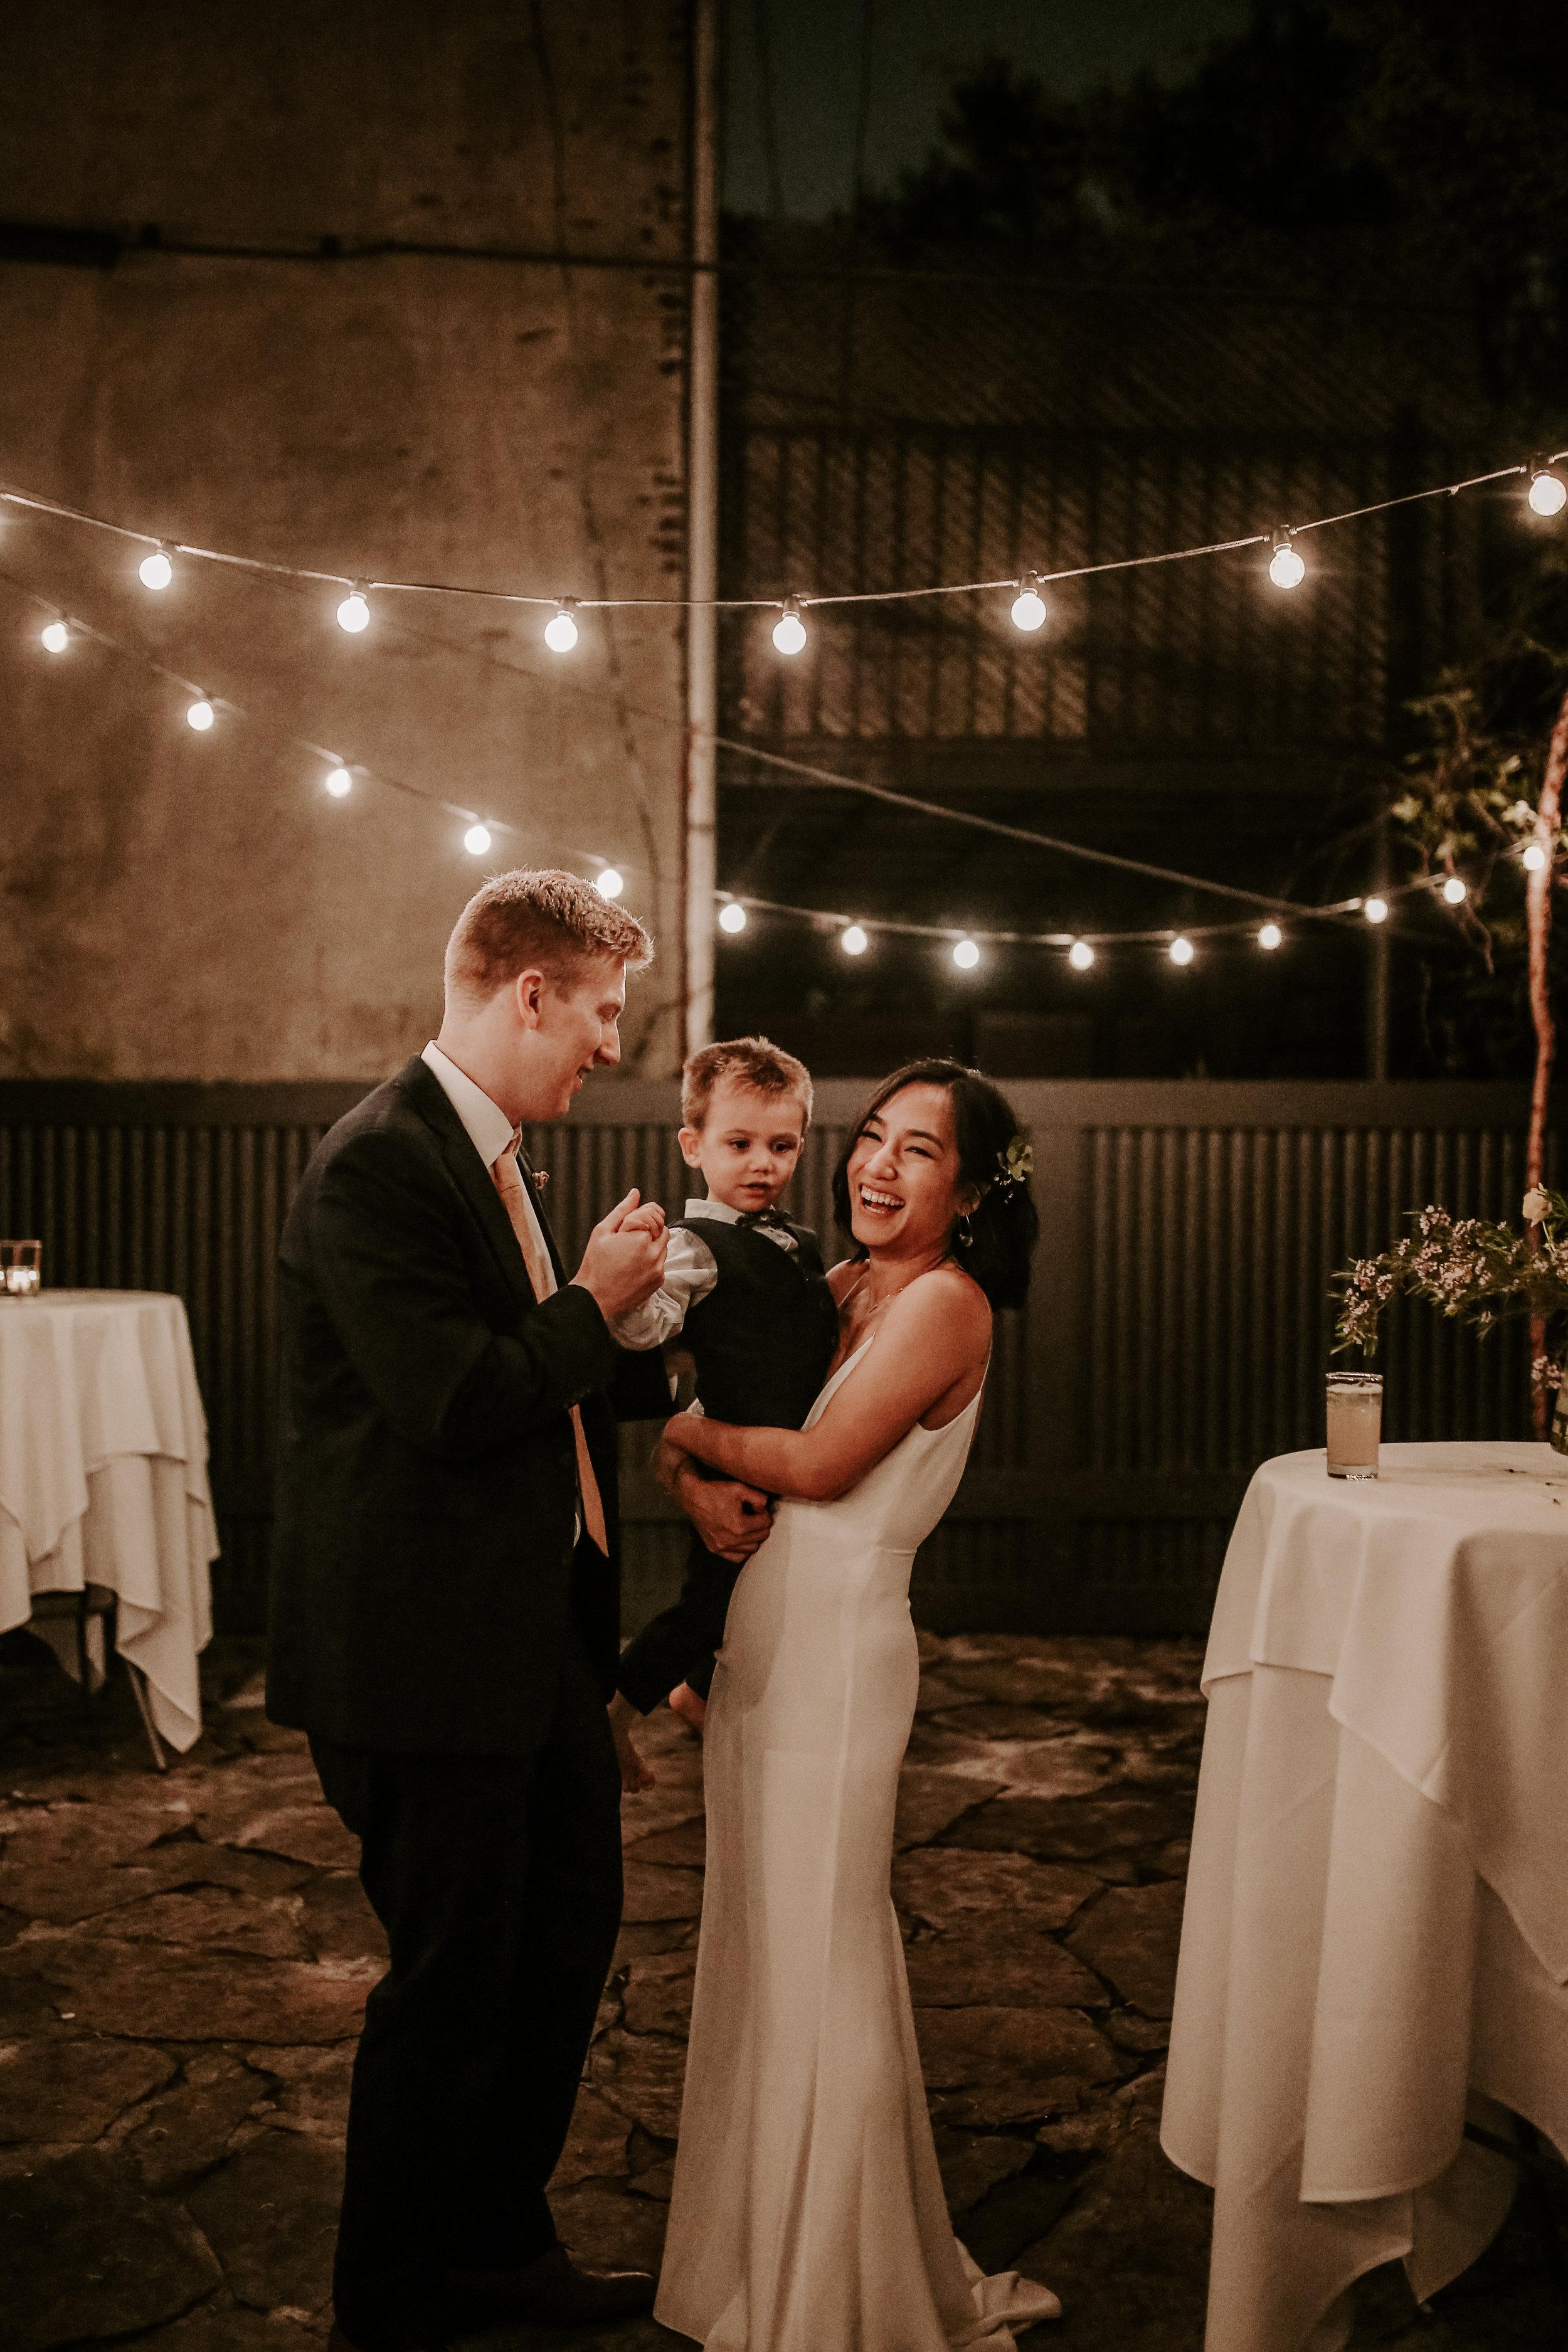 TheNichols_Married_2019-348.jpg